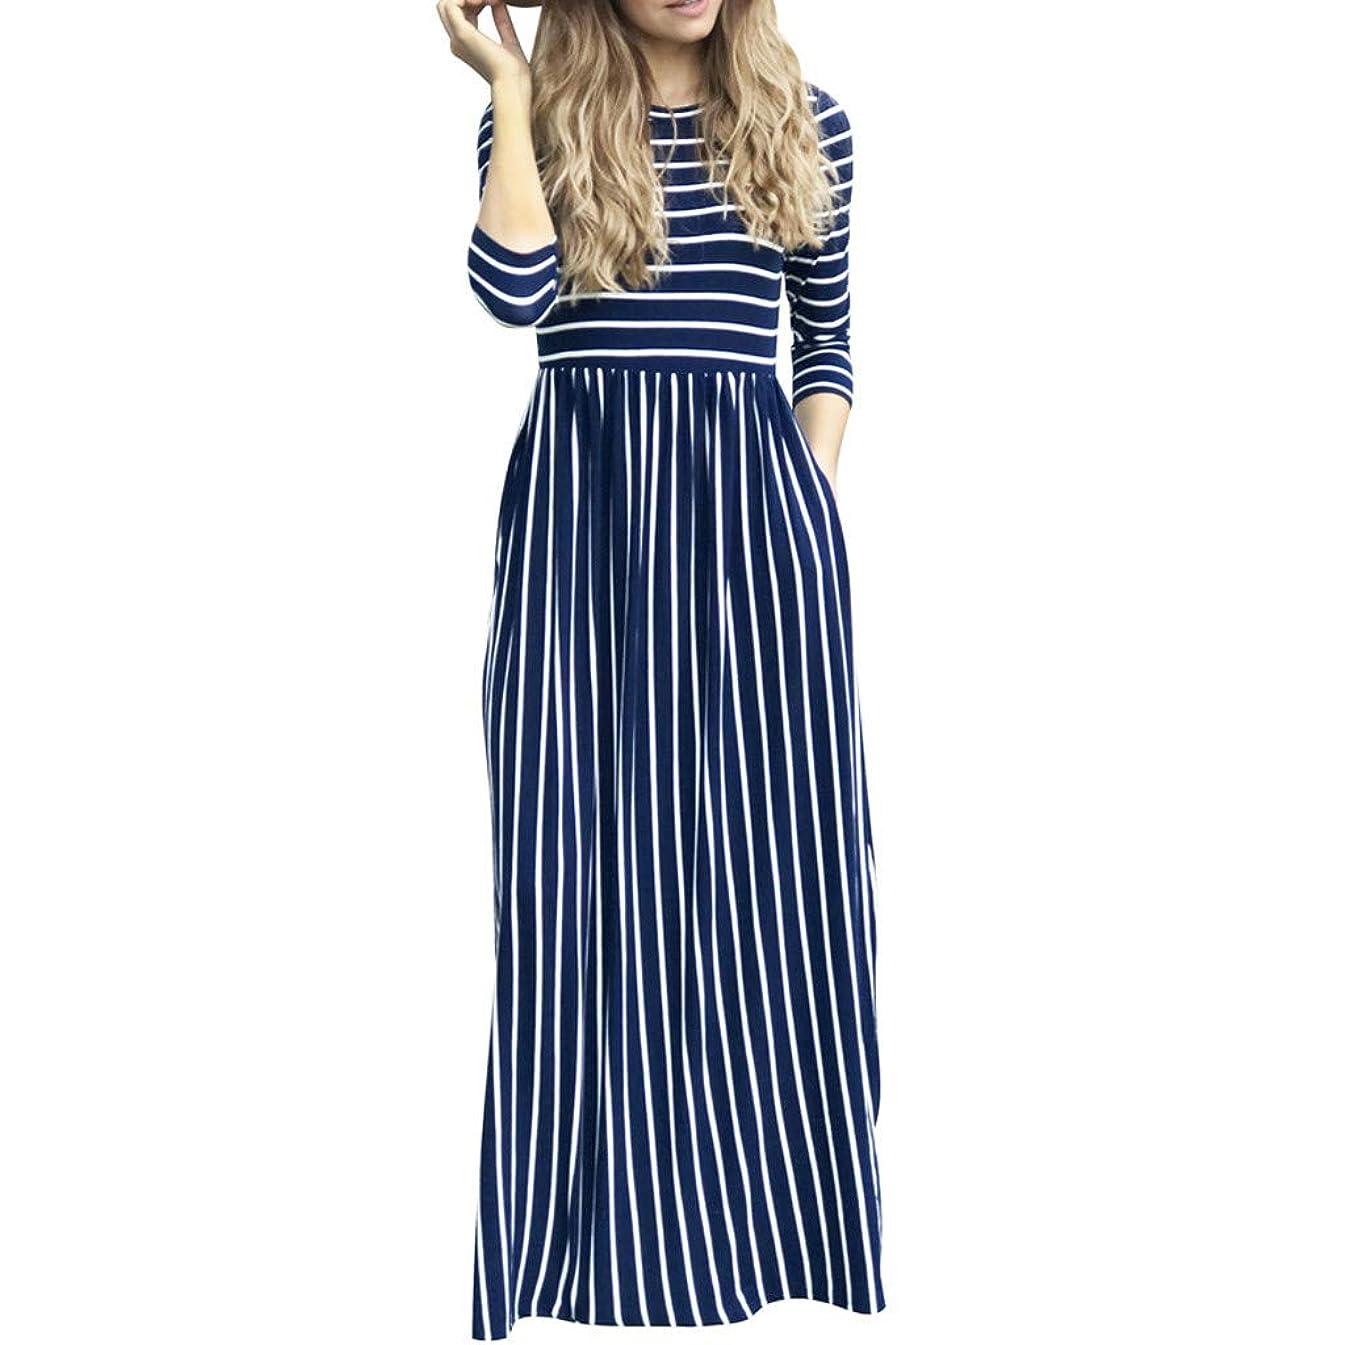 DondPO Women Boho Long Dresses Sleeve Loose Crew Neck Plain Maxi Dresses Casual with Pockets